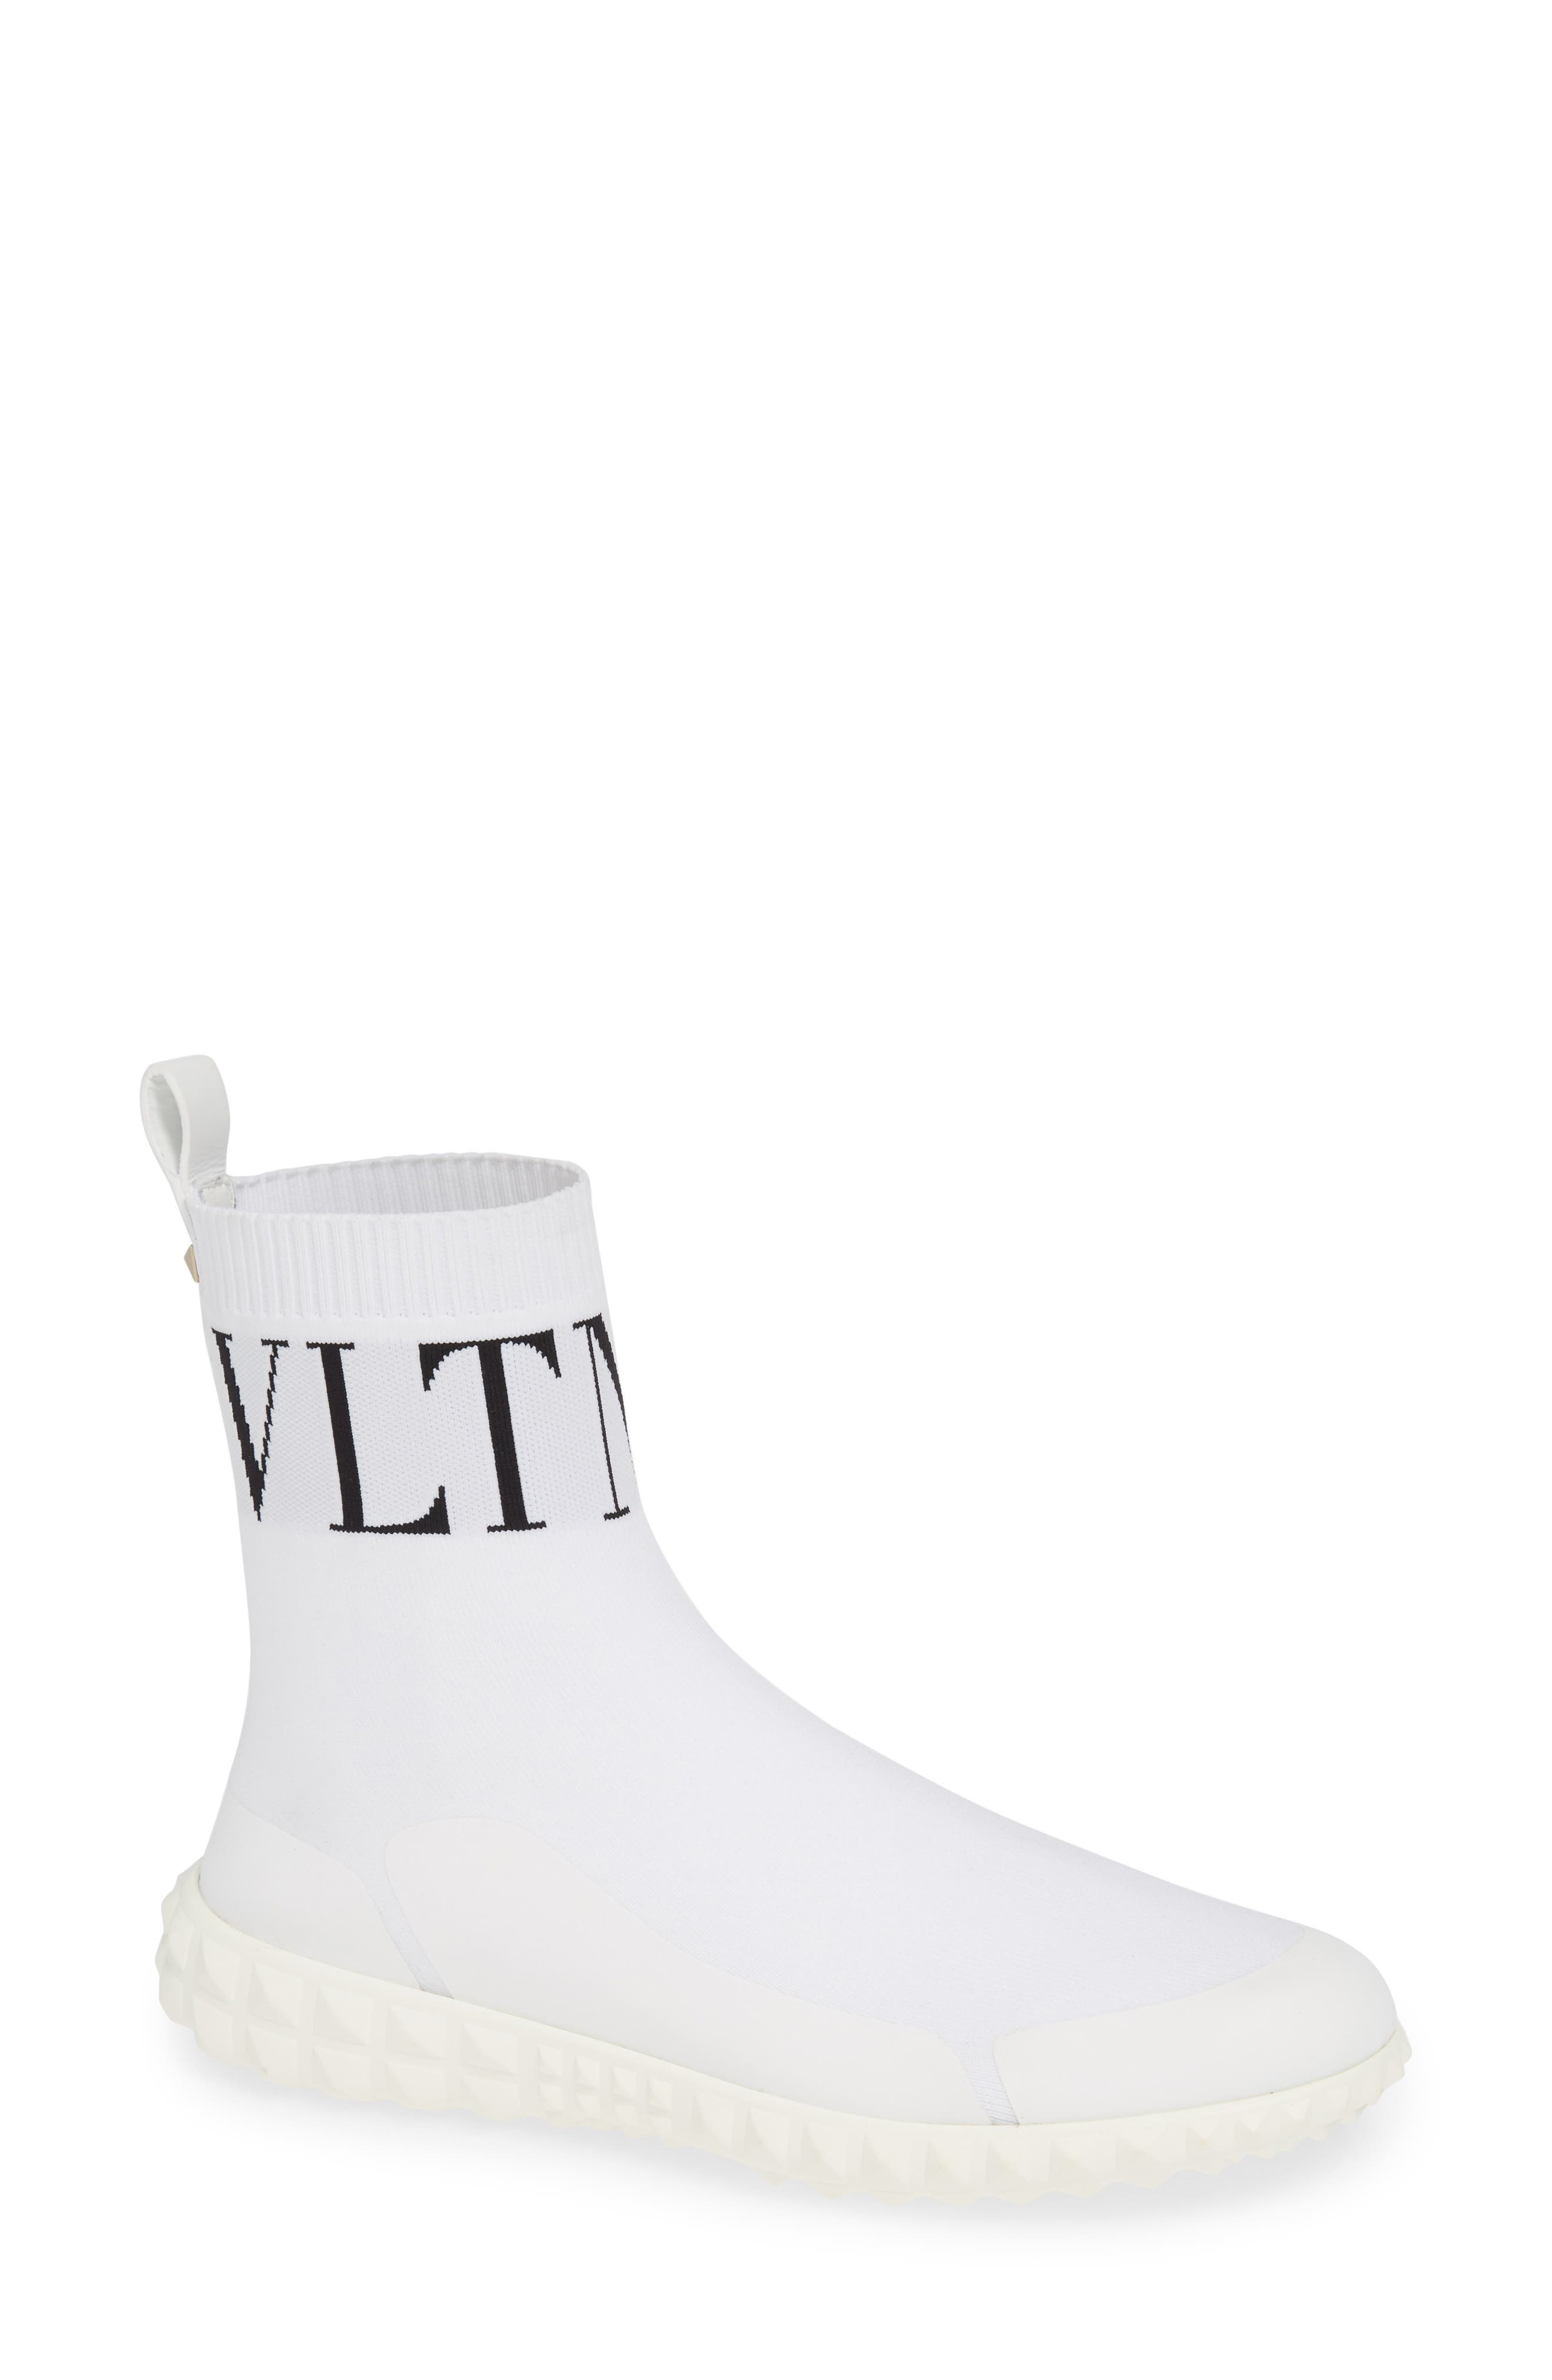 VALENTINO GARAVANI VLTN Slip-On Sock Sneaker, Main, color, WHITE